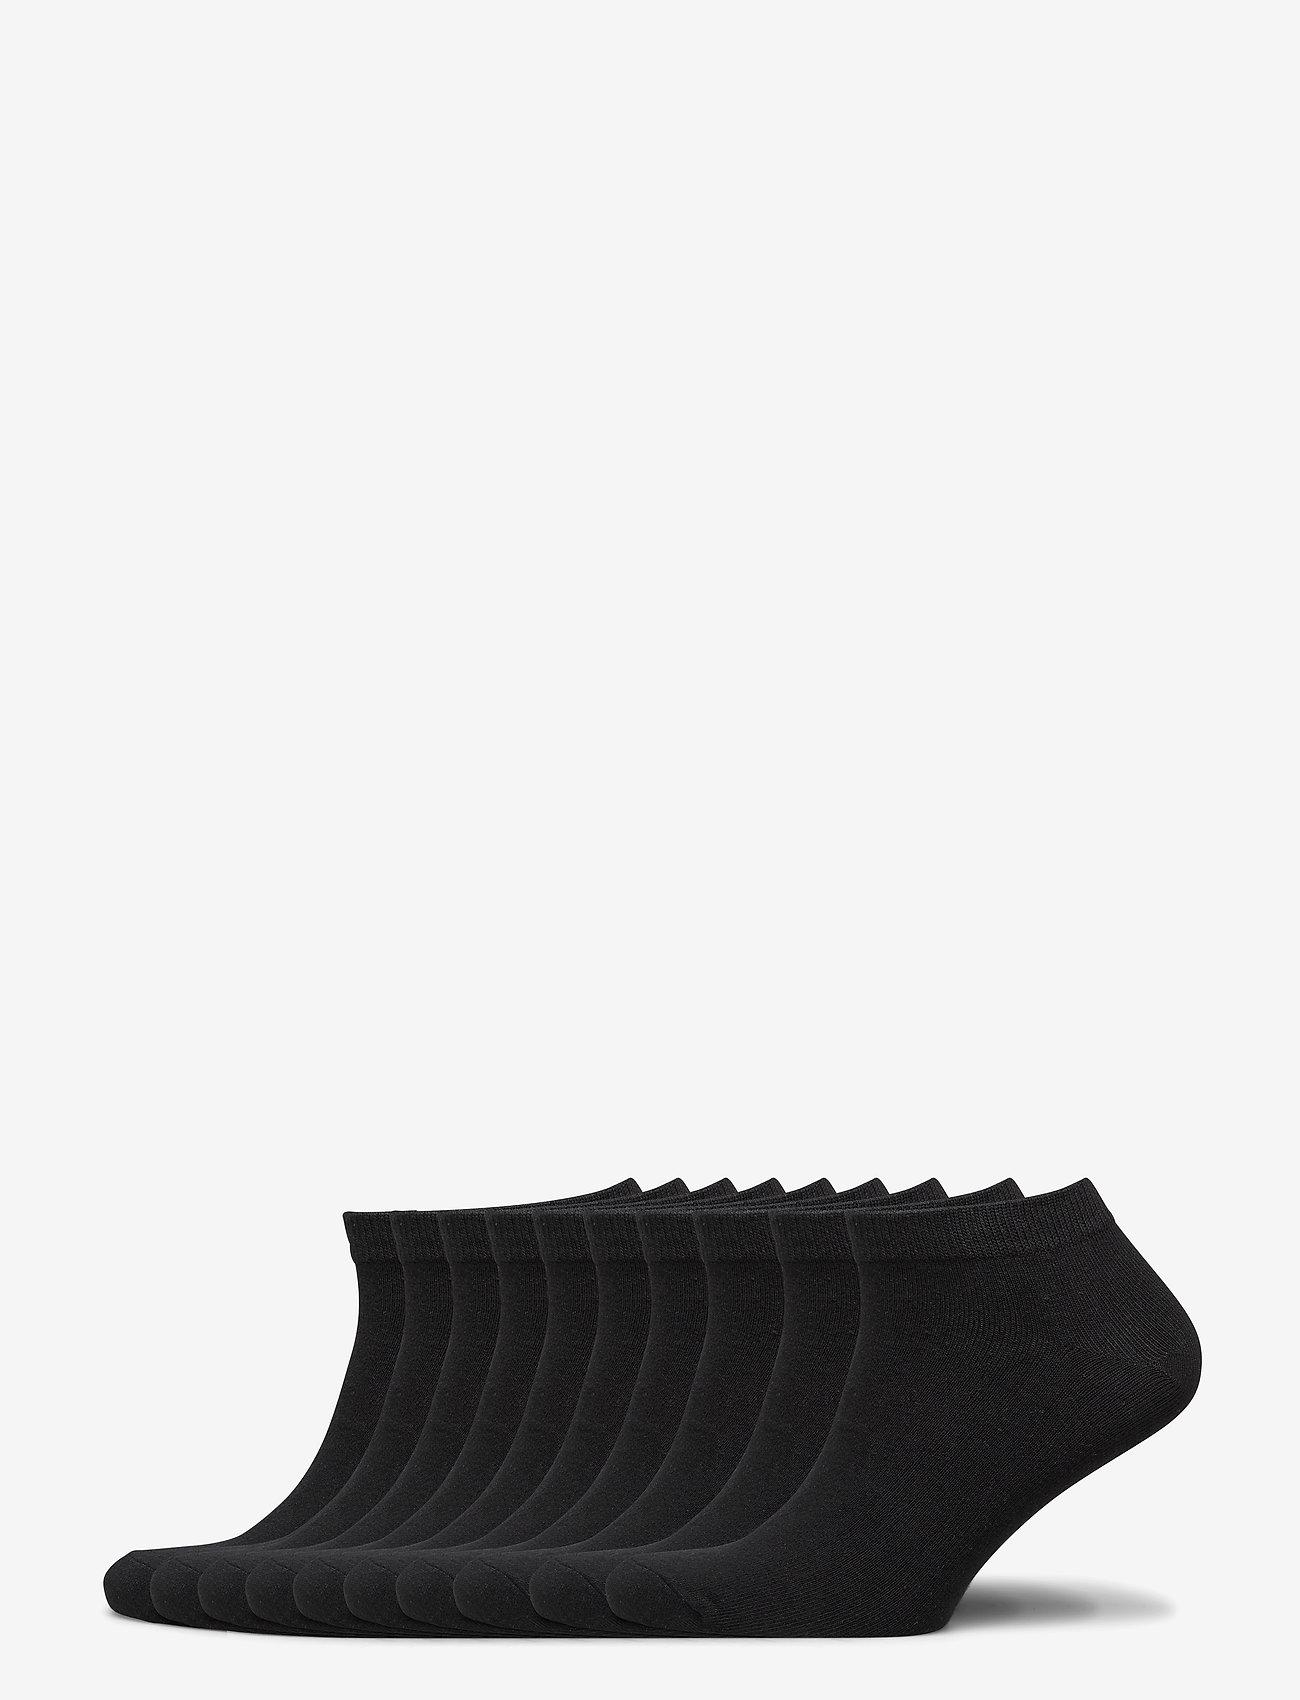 Jack & Jones - JACDONGO SOCKS 10 PACK NOOS - skarpety za kostkę - black - 0